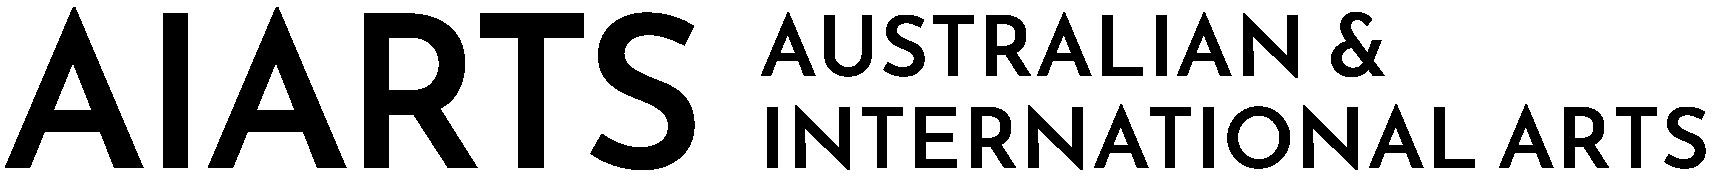 AIARTS - Australian & International Arts, AI Arts Blackwood